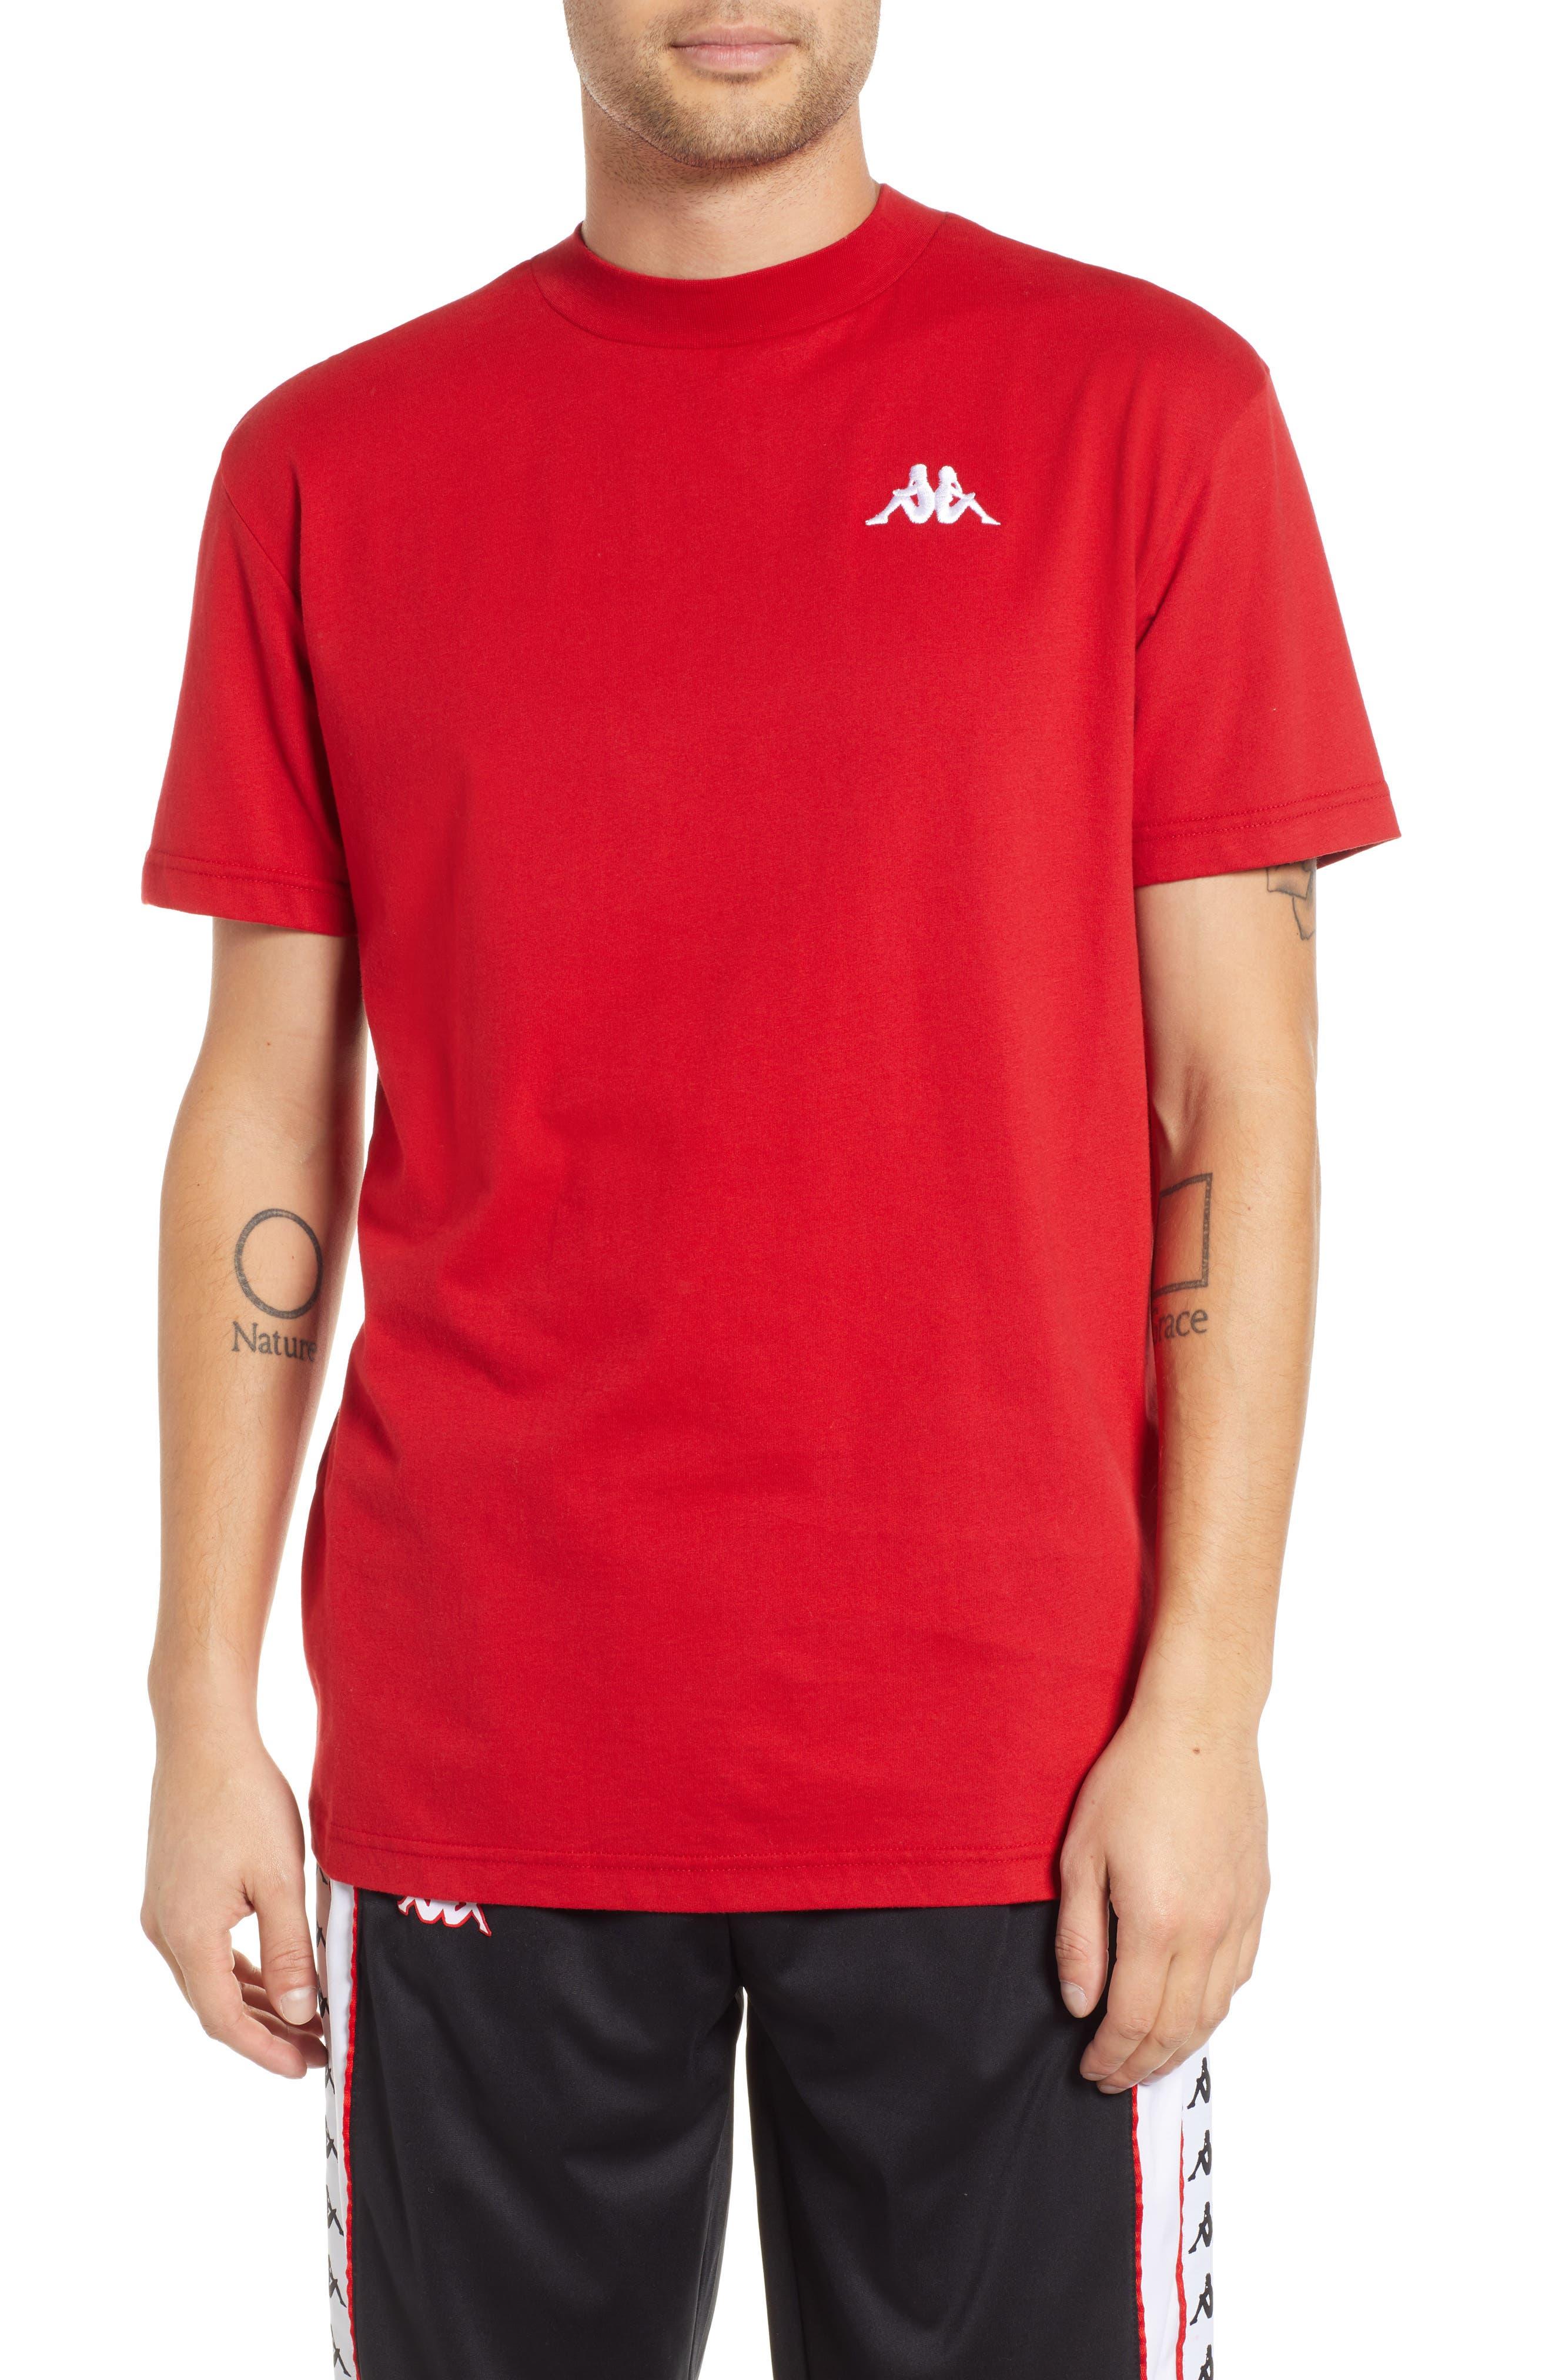 Kappa Active Authentic Bzalaya Logo T-Shirt, Red